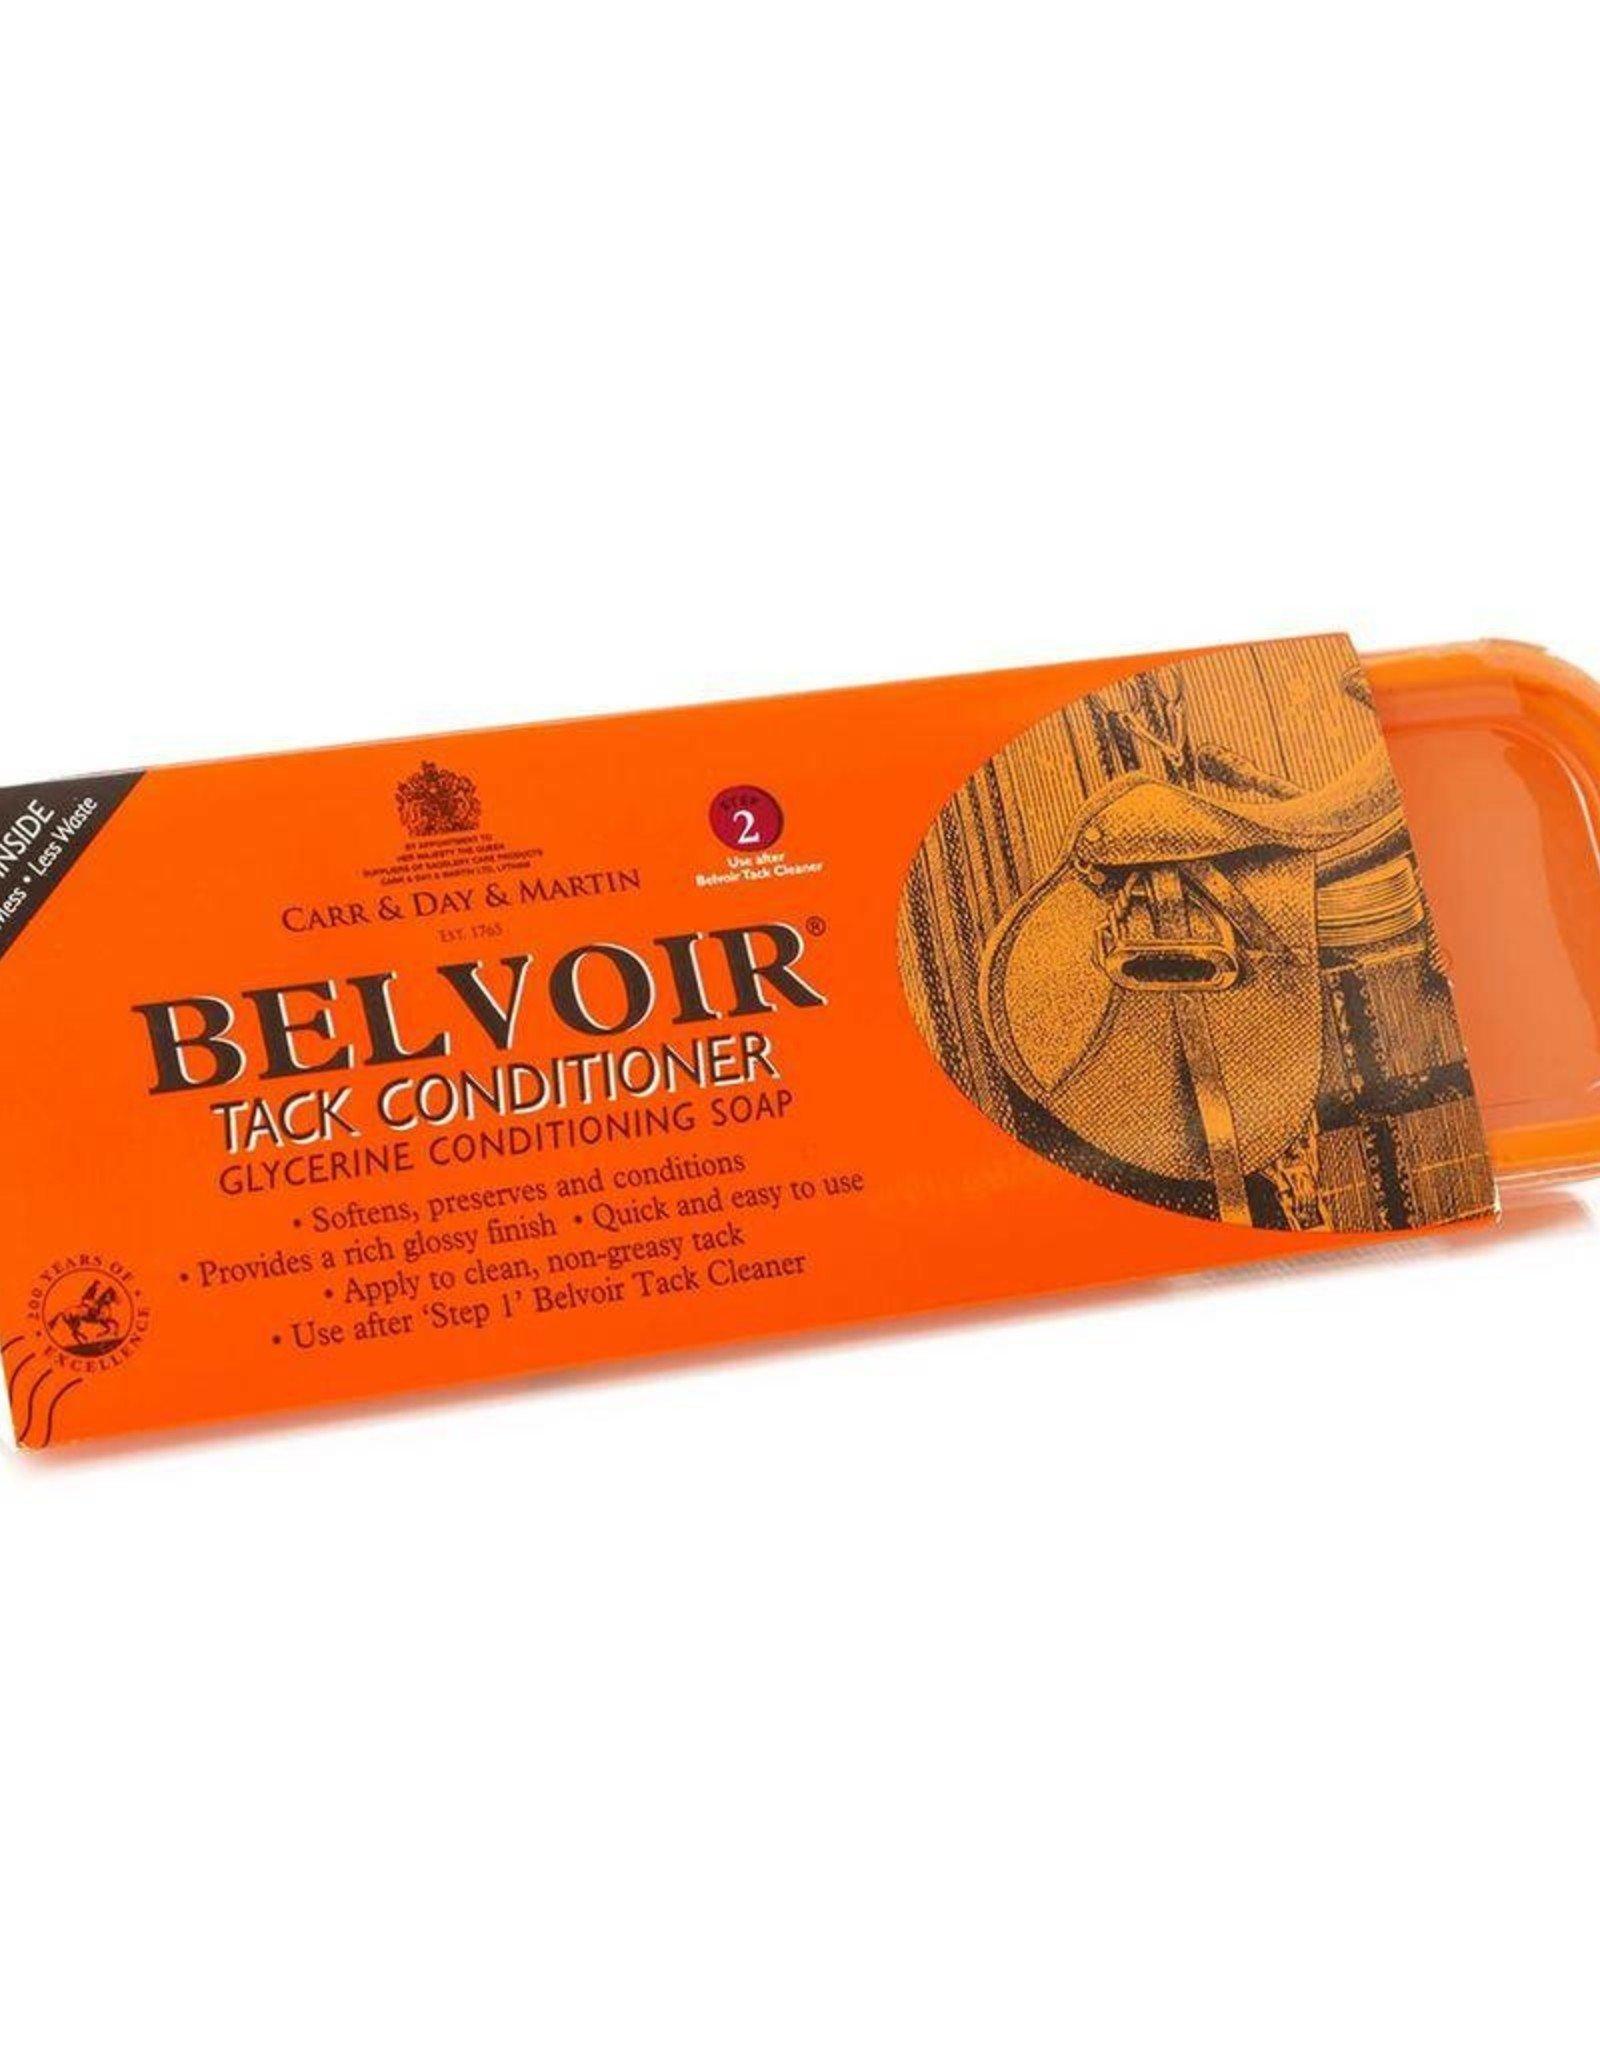 Belvoir Glycerine Conditioning Soap Bar